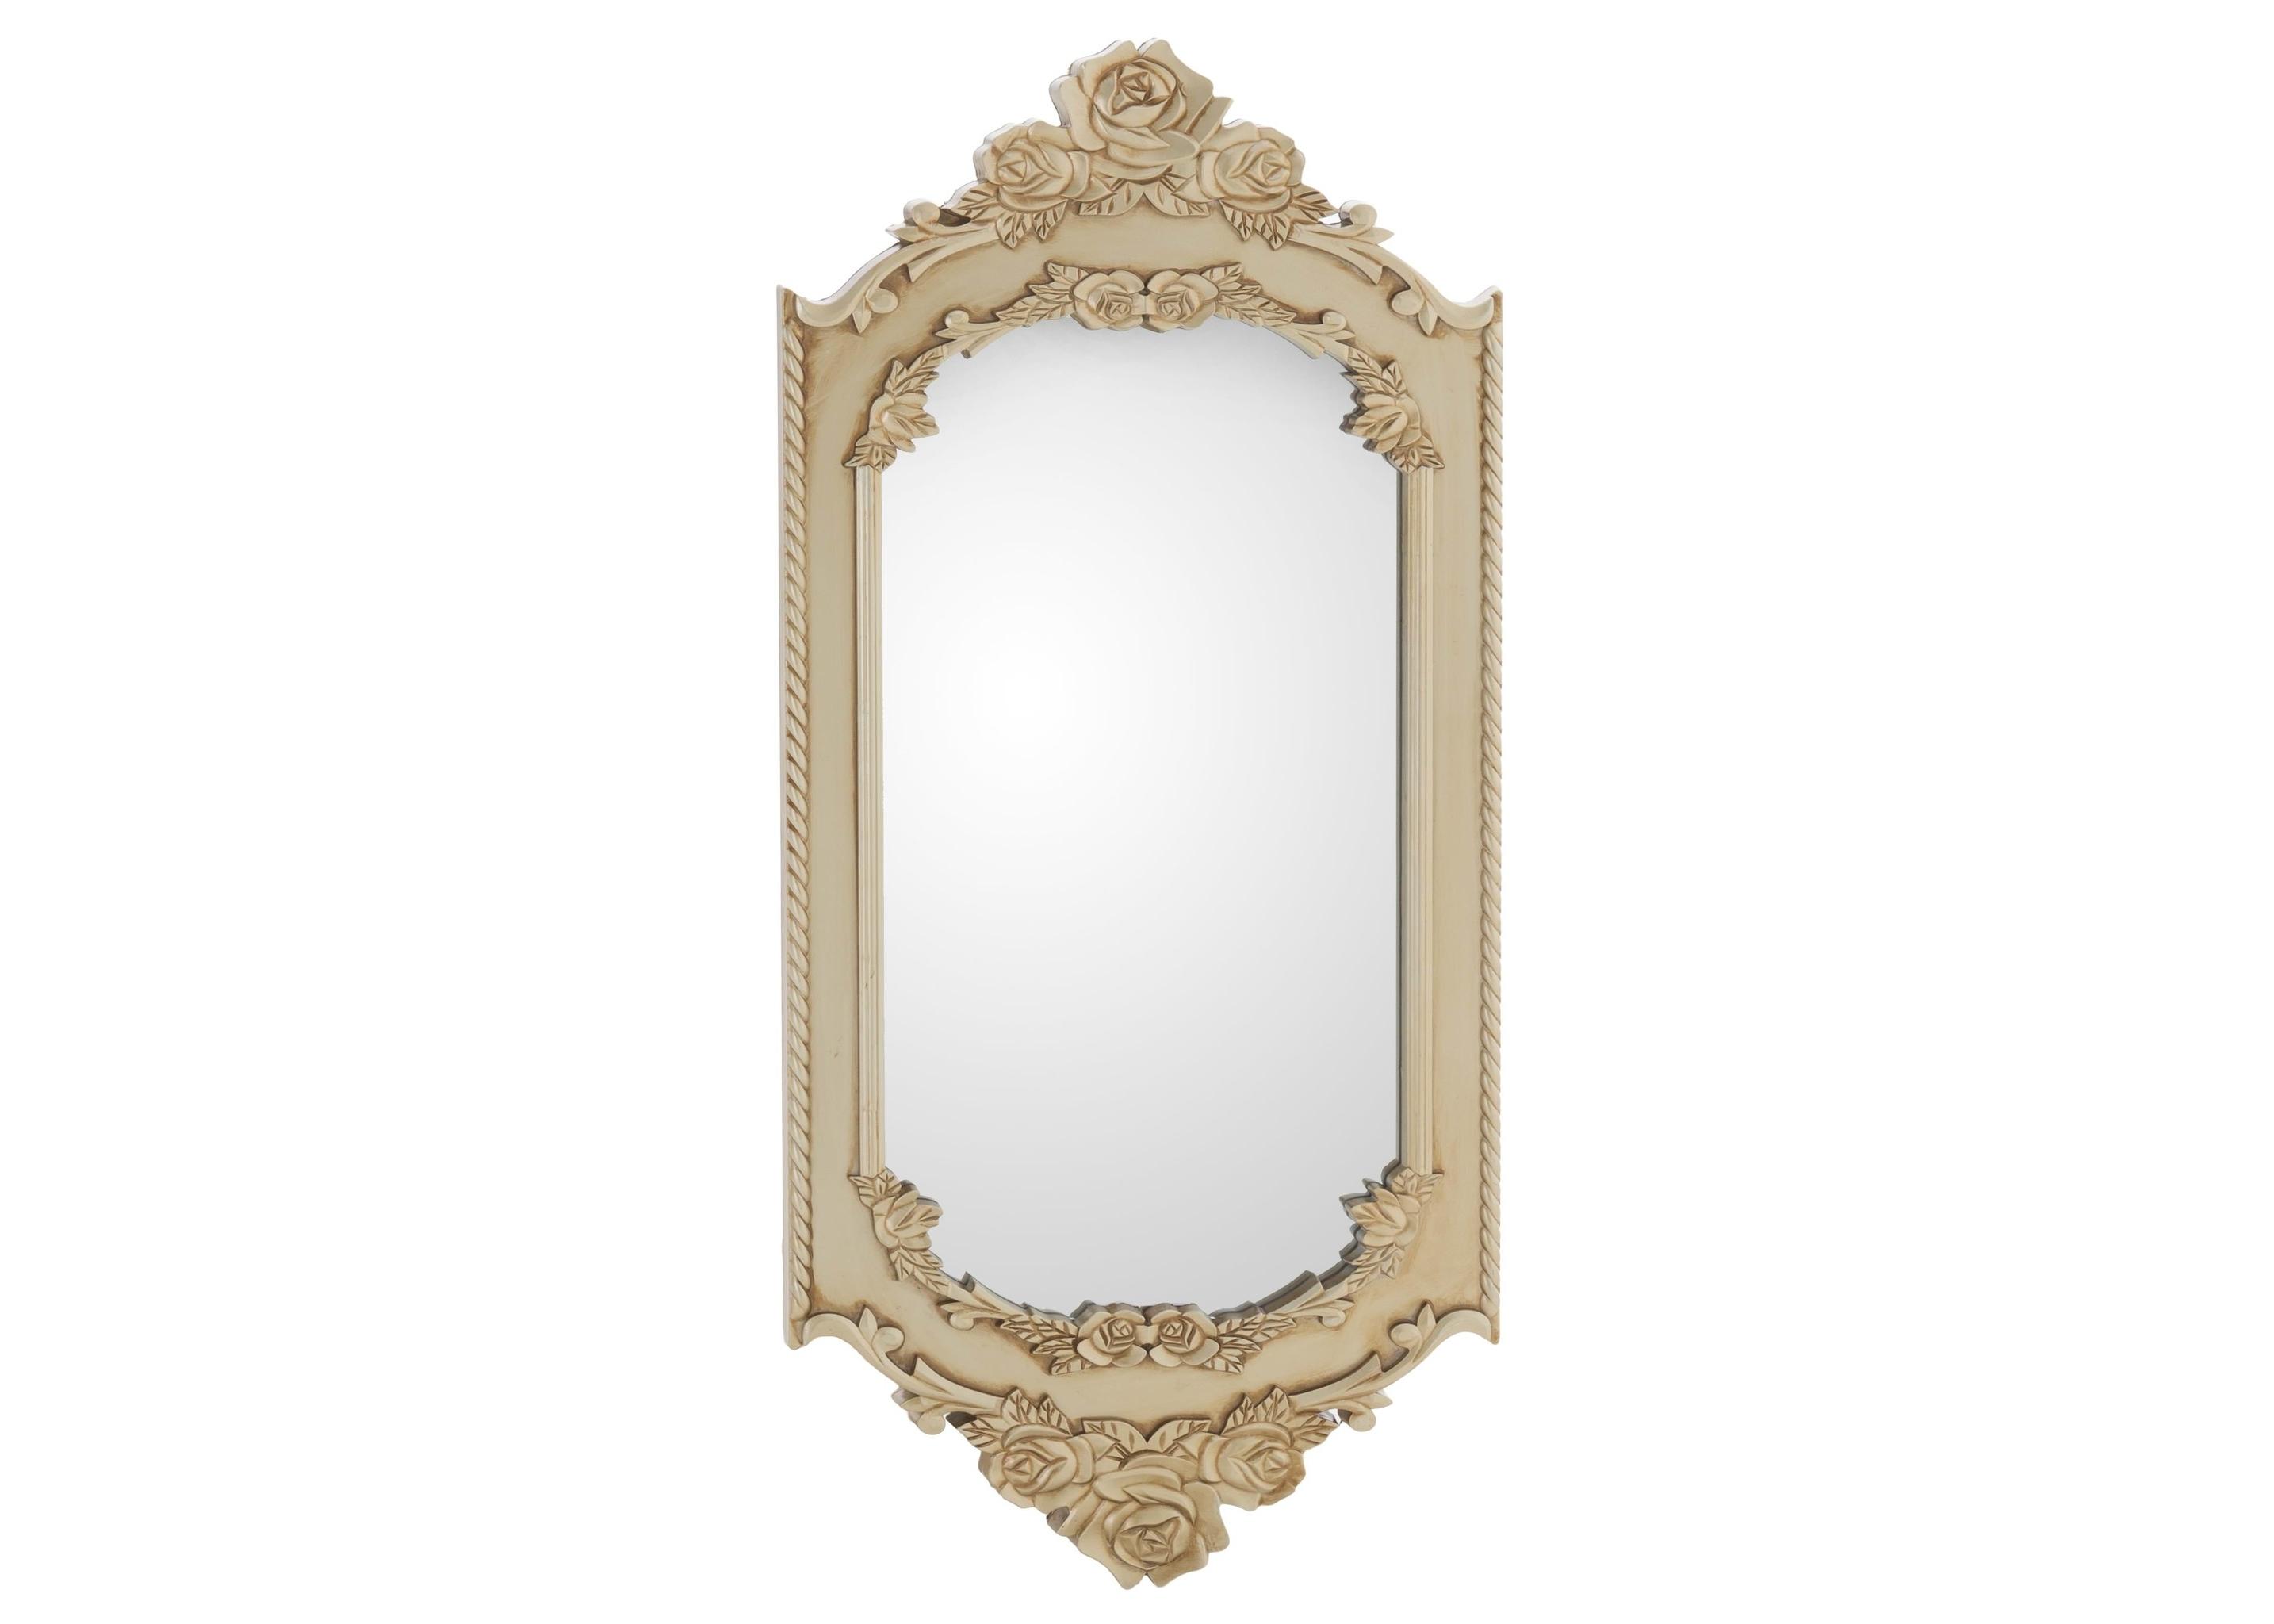 Зеркало MulhouseНастенные зеркала<br><br><br>Material: Пластик<br>Width см: 37<br>Depth см: 2<br>Height см: 77